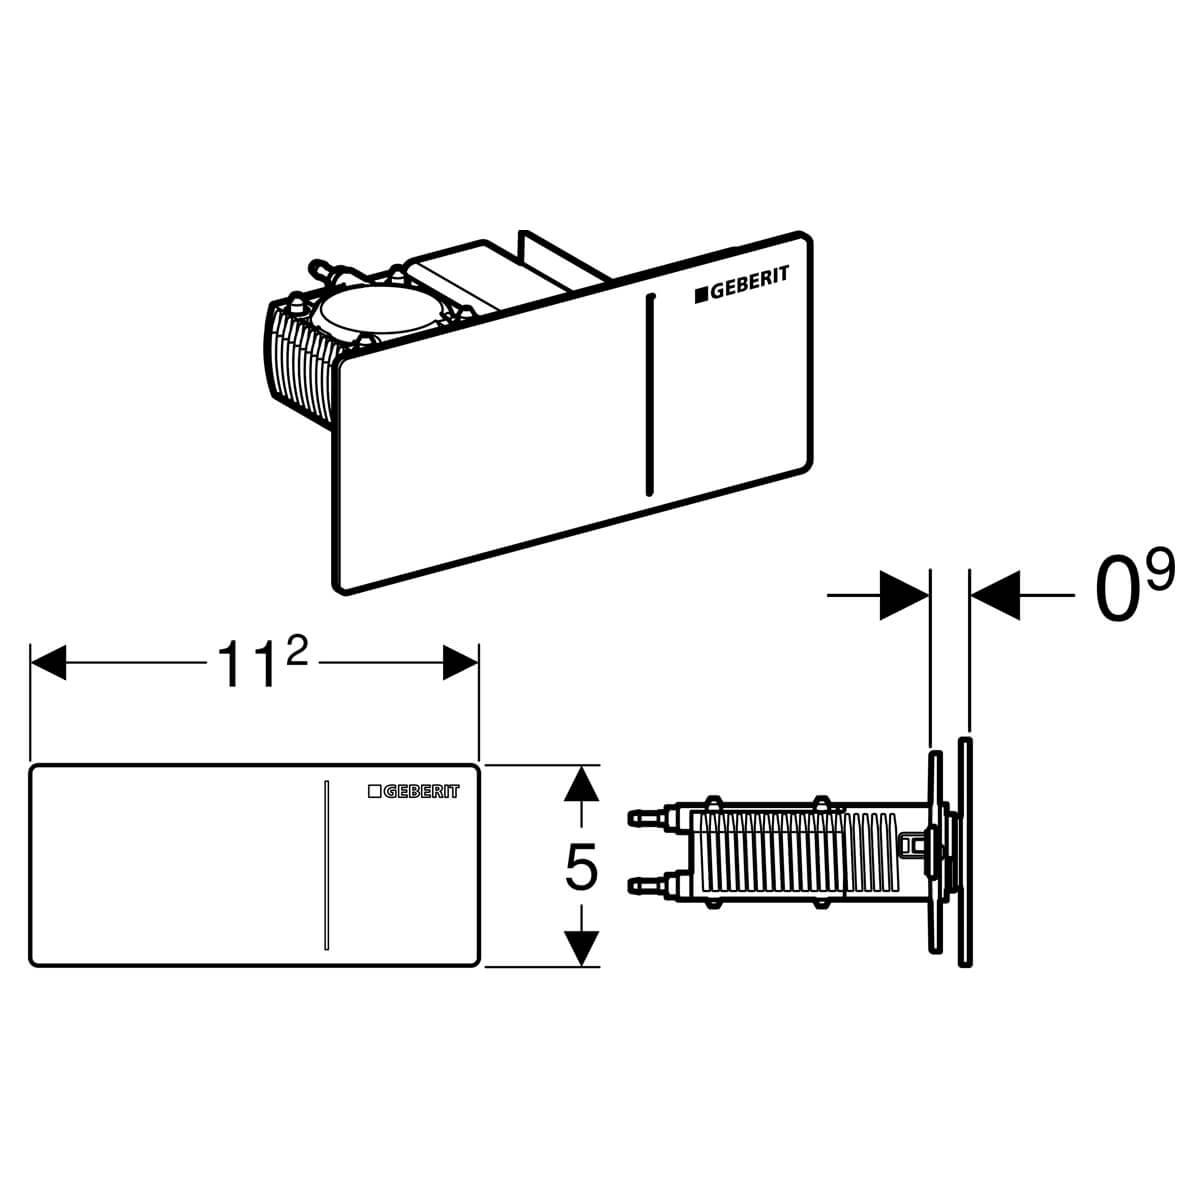 Geberit Omega70 Brushed Stainless Steel Dual Flush